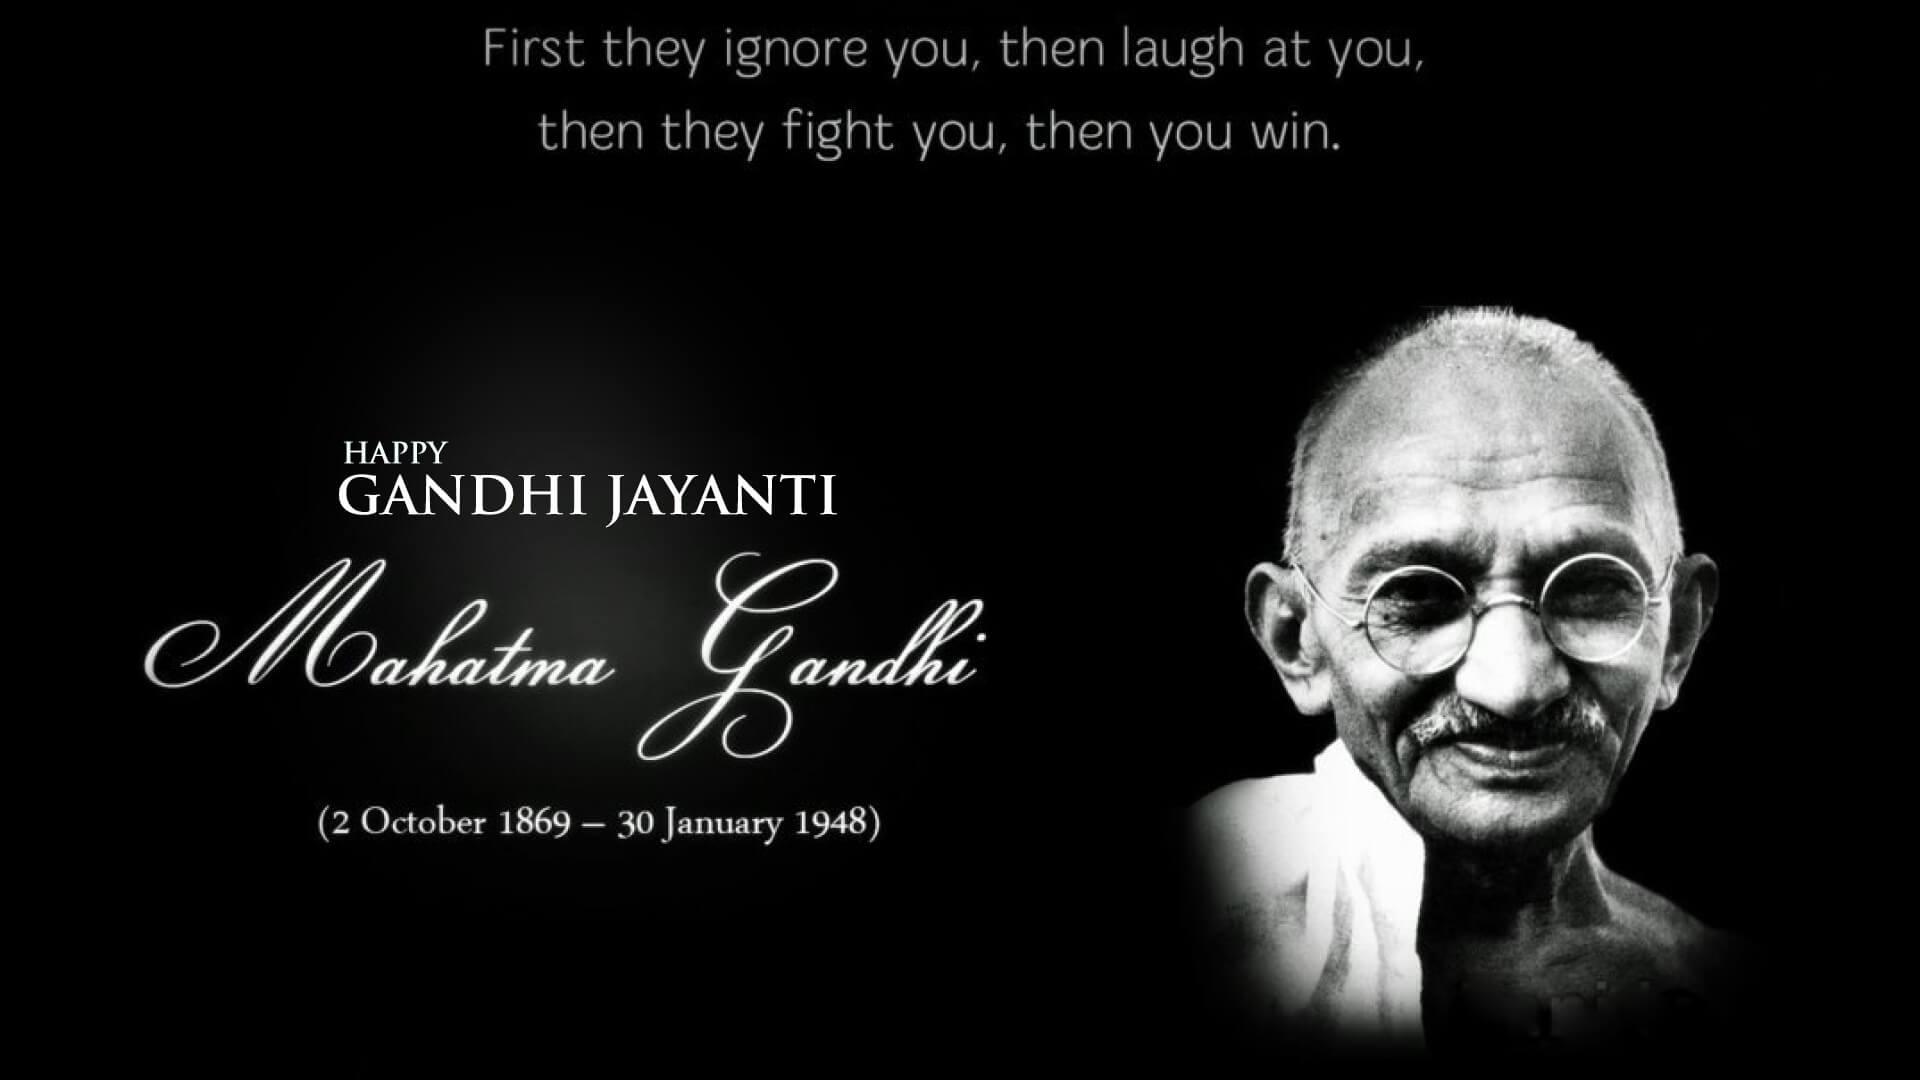 gandhi jayanti october 2 success quotes hd wallpaper